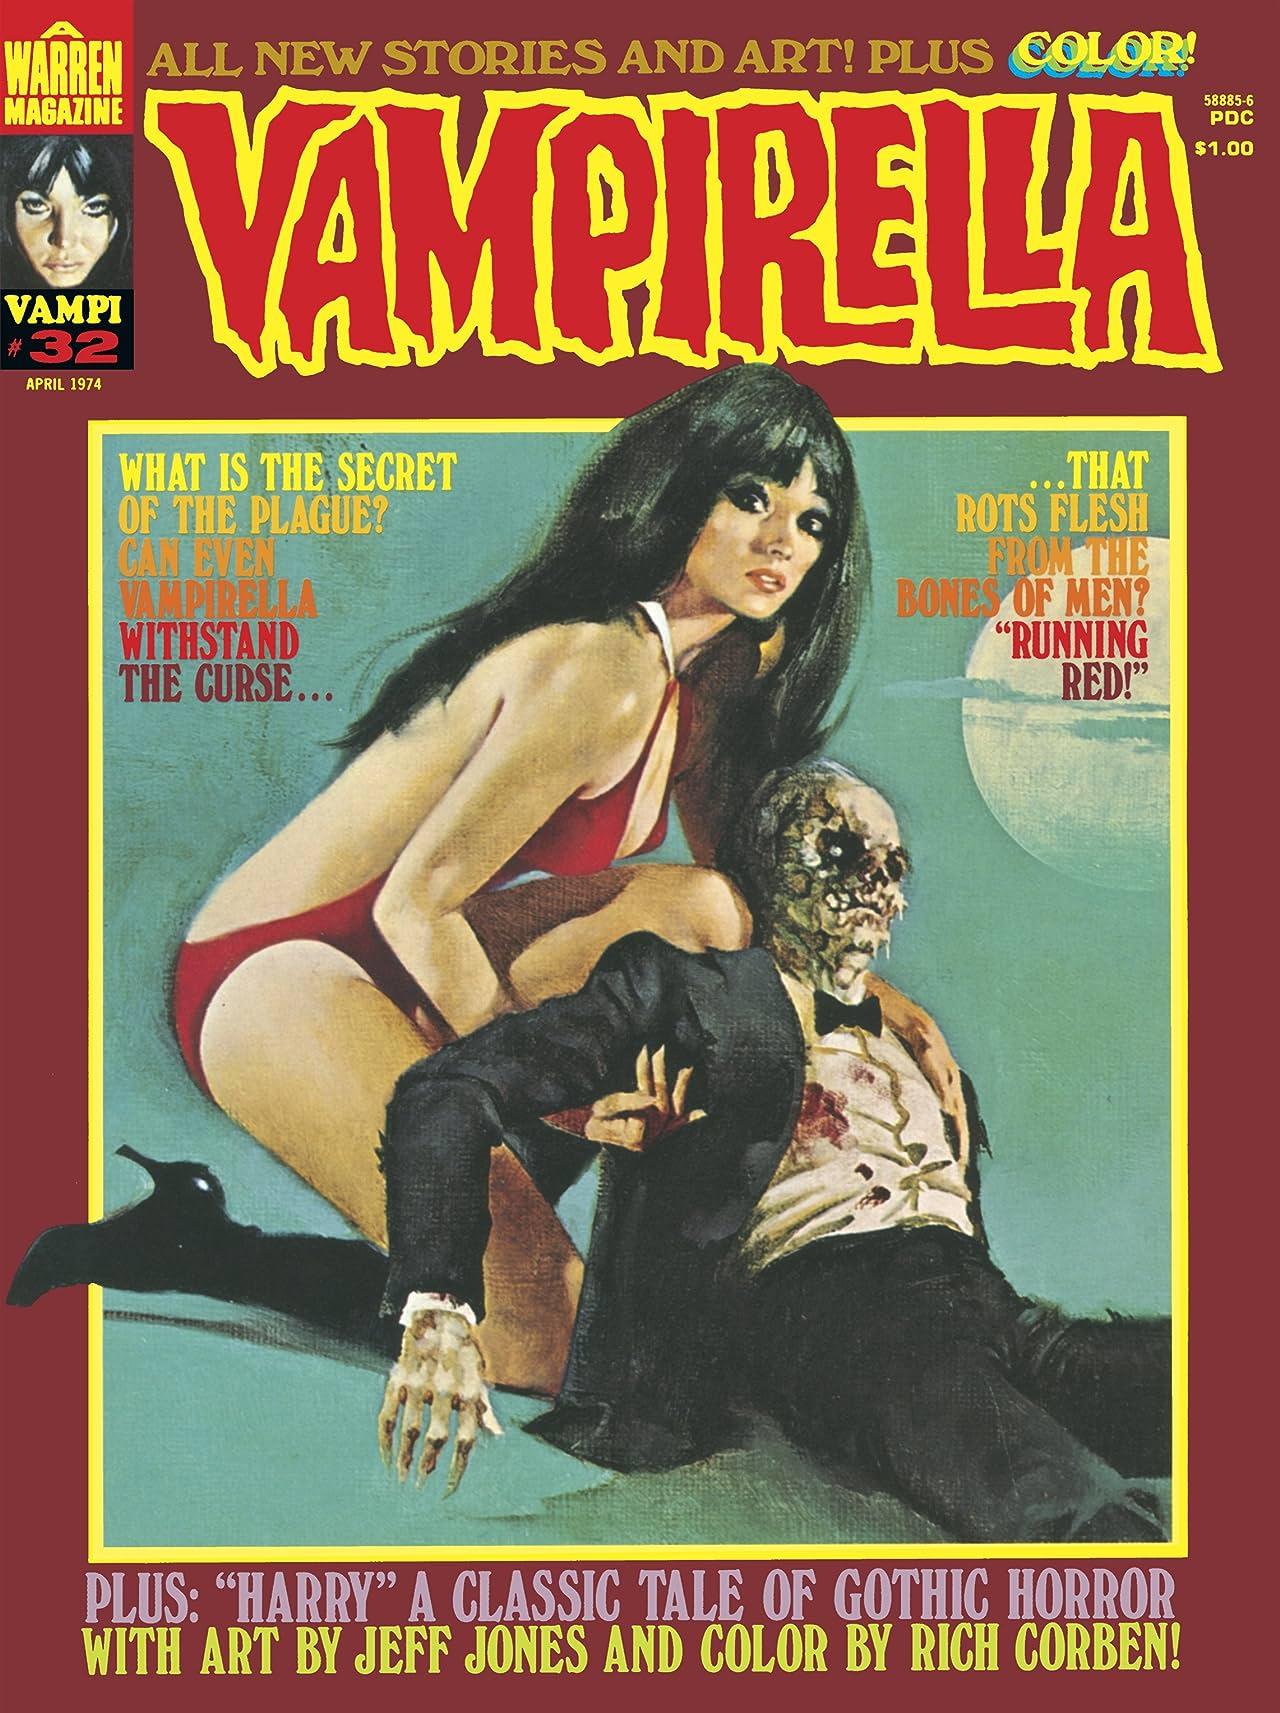 Vampirella (Magazine 1969-1983) #32